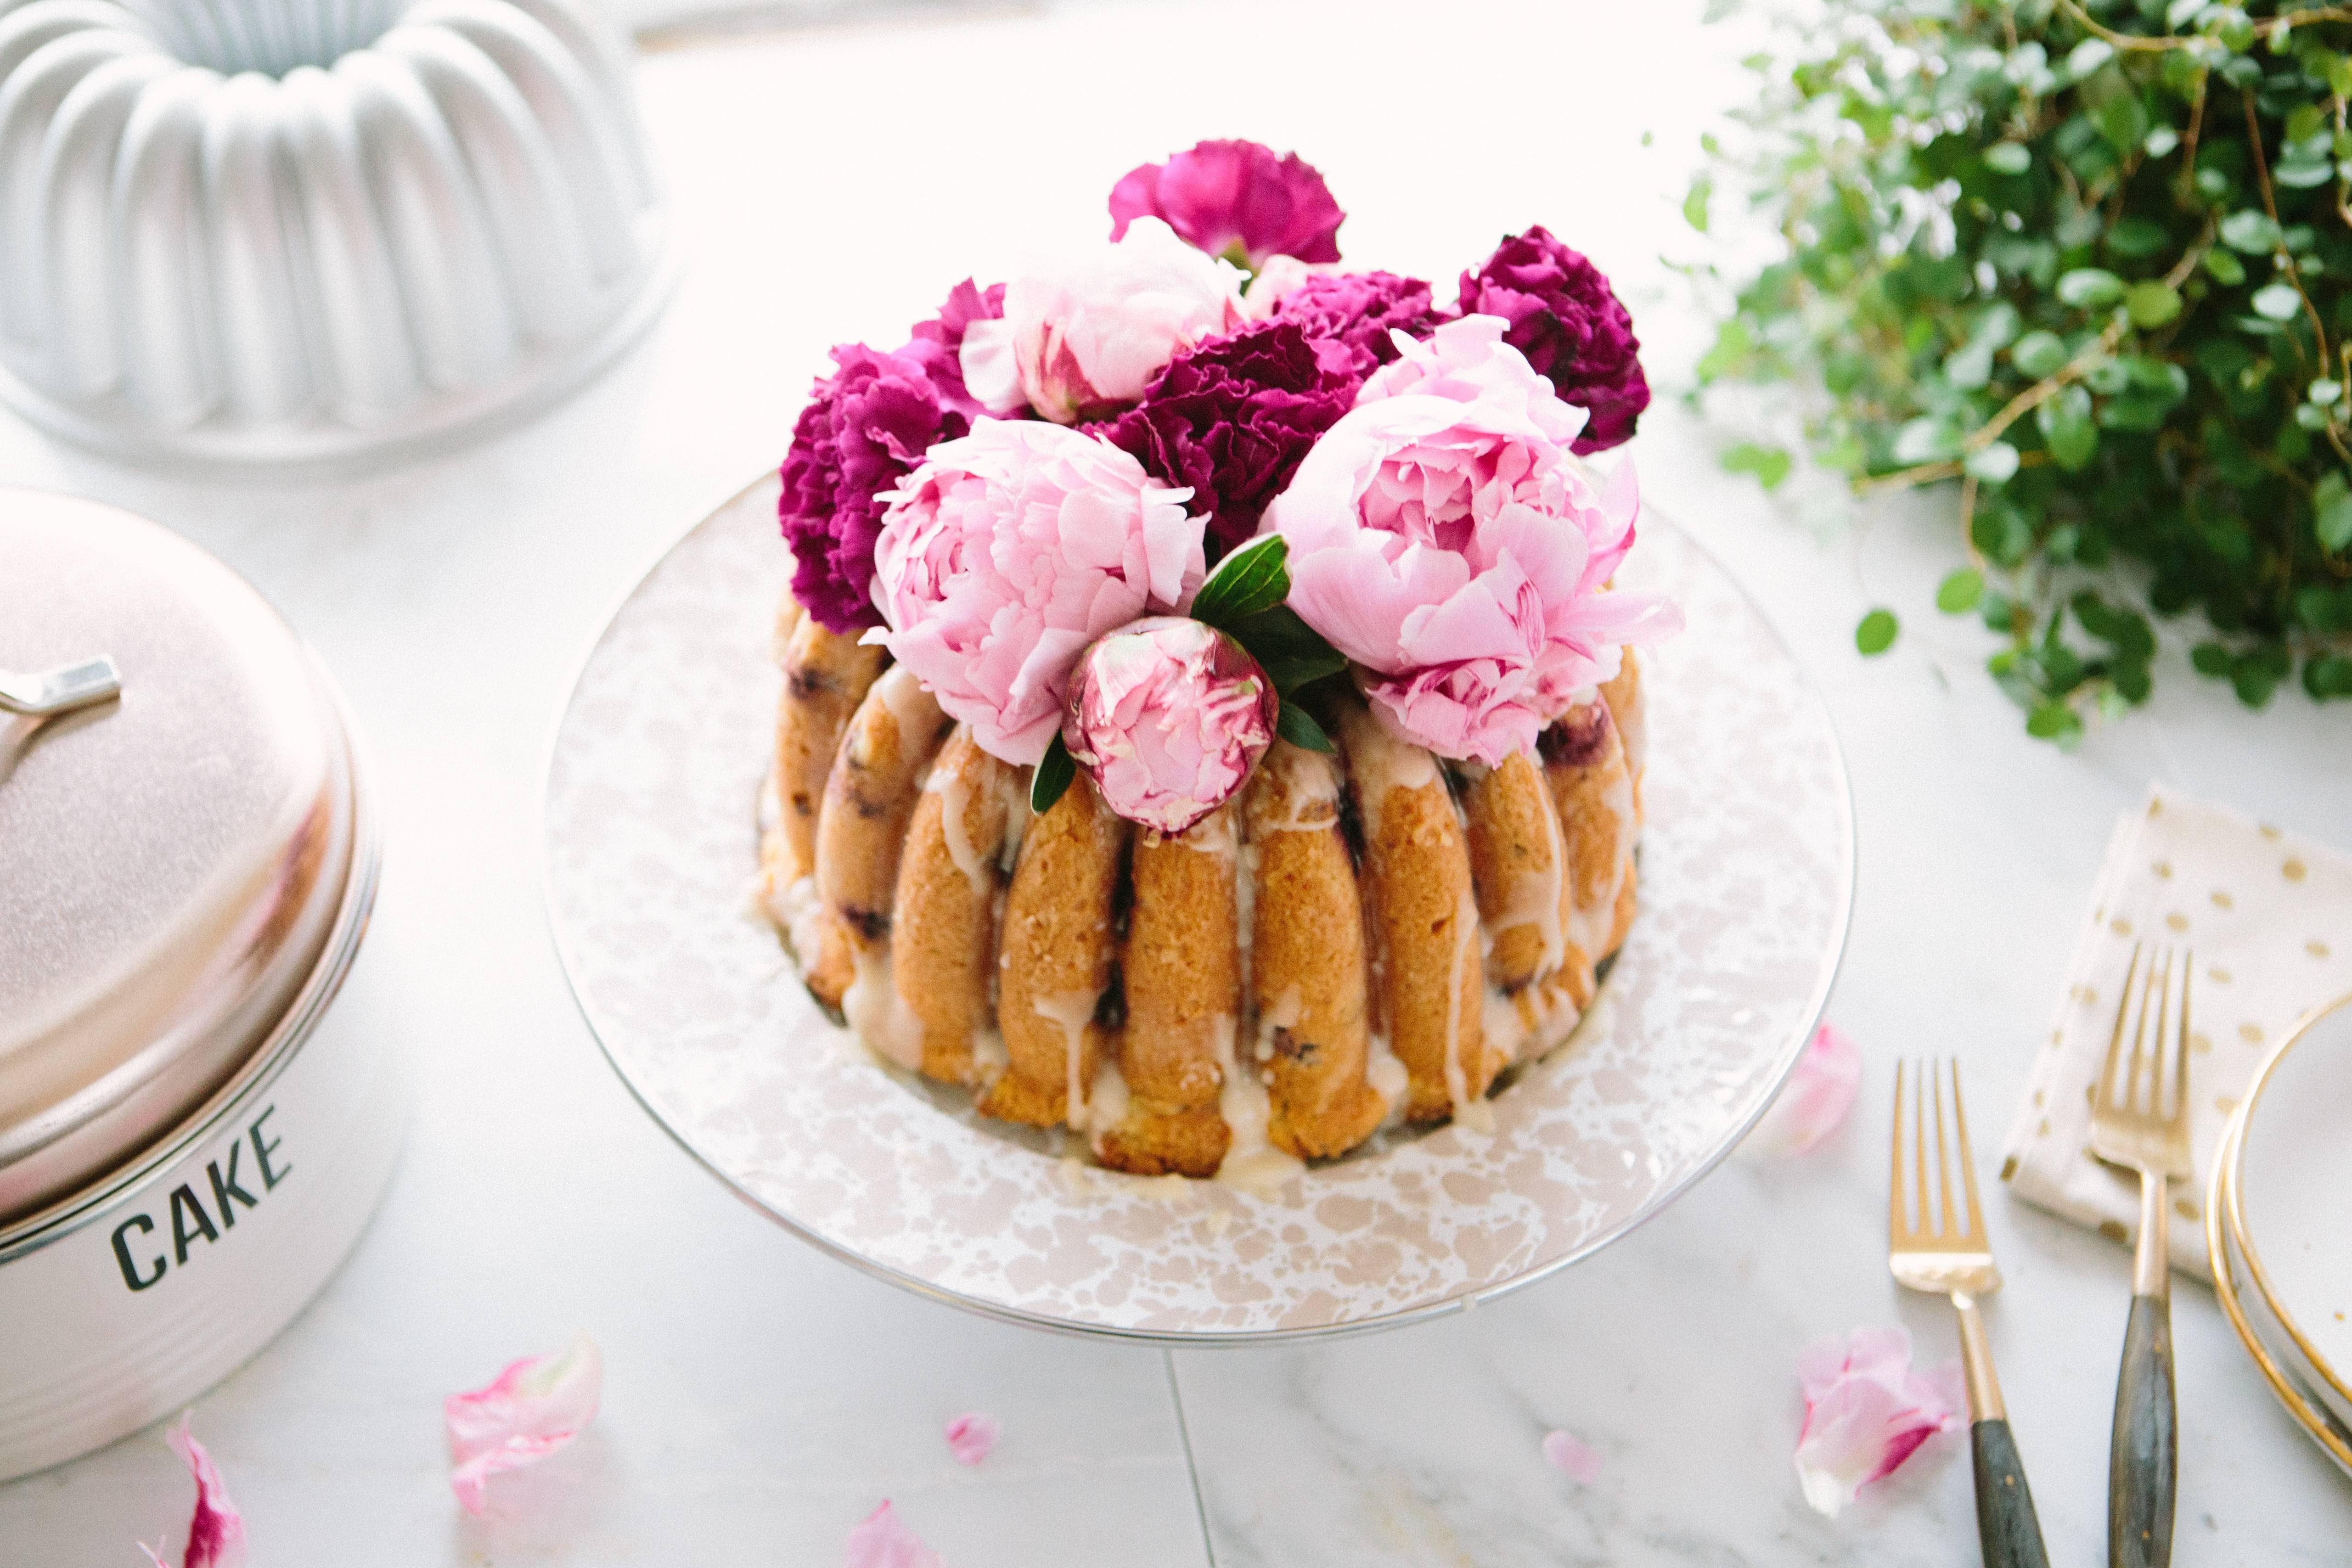 Blackberry Champagne Bundt Cake with Amaretto Glaze